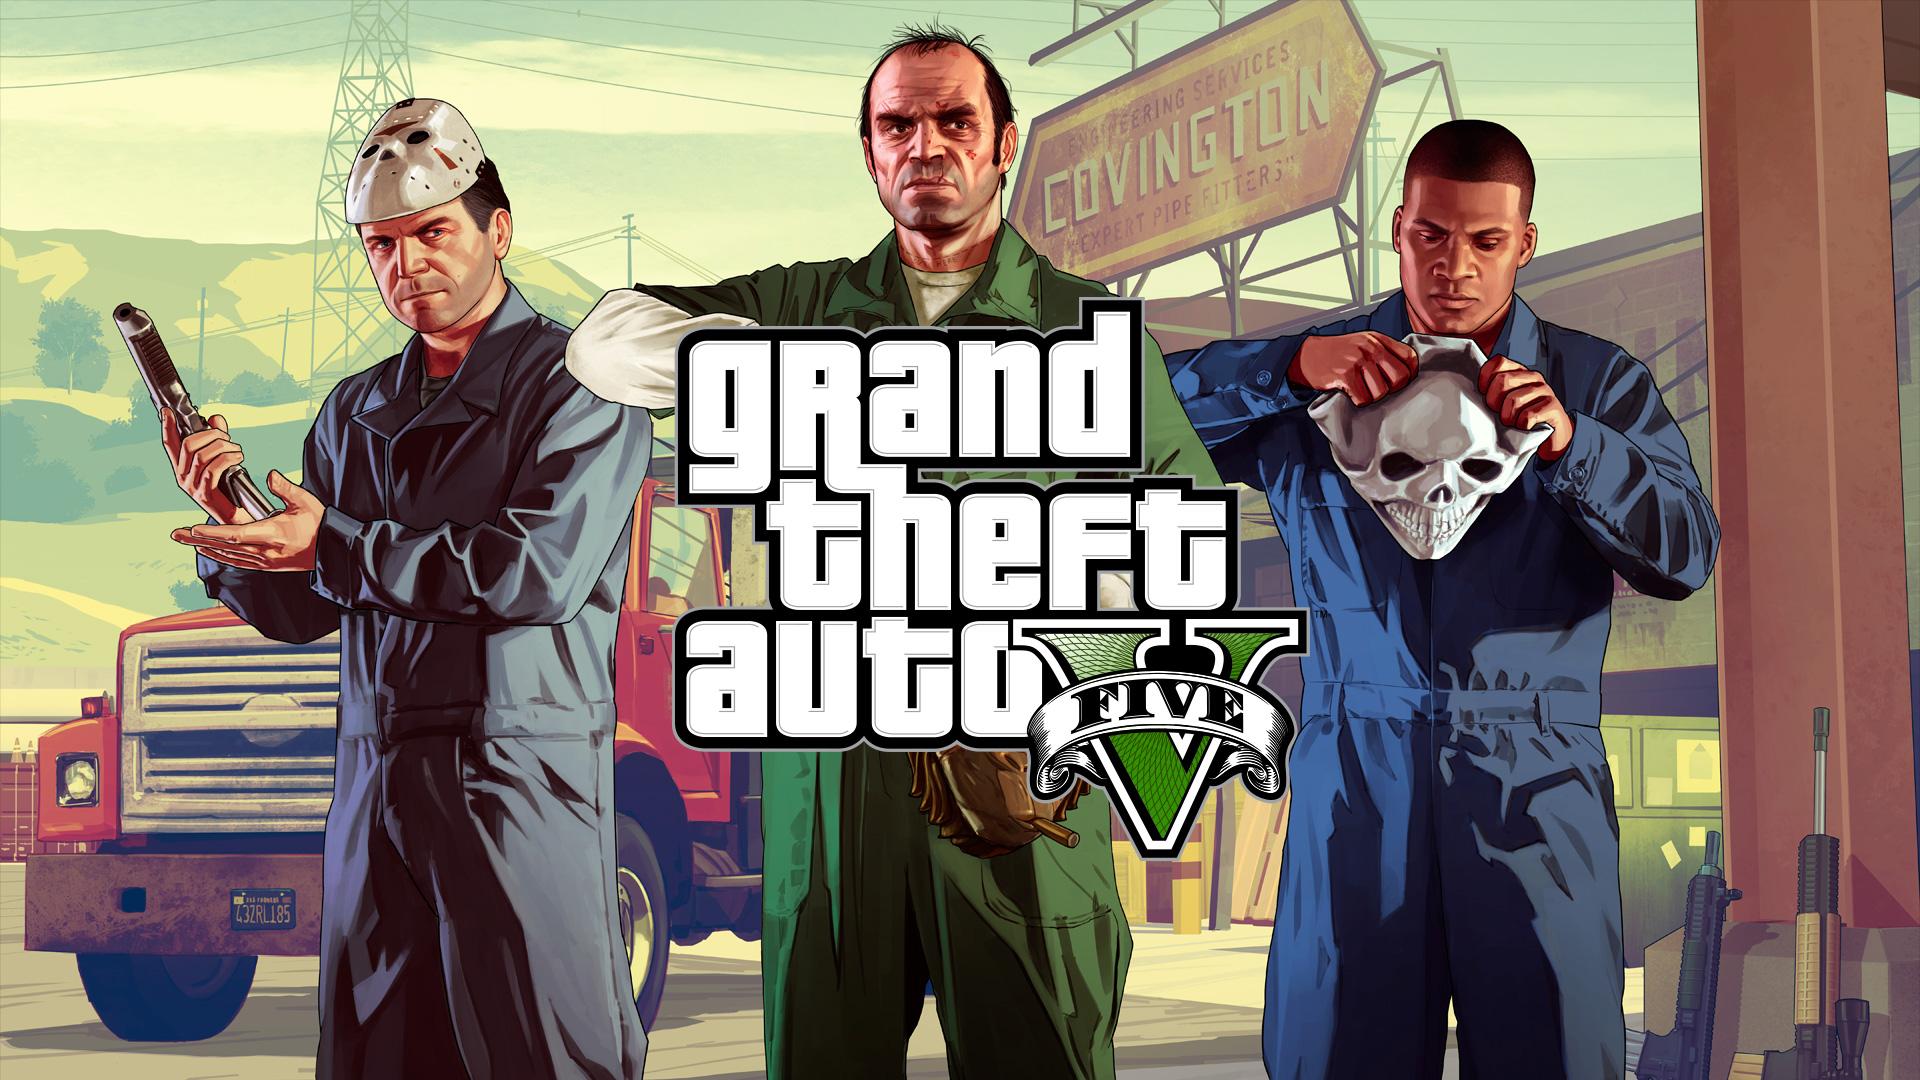 Artistry in Games gtav_xbox360tv_1280 How I Broke GTA V By Being Sane Opinion  V Theft GTA V gta Grand Auto